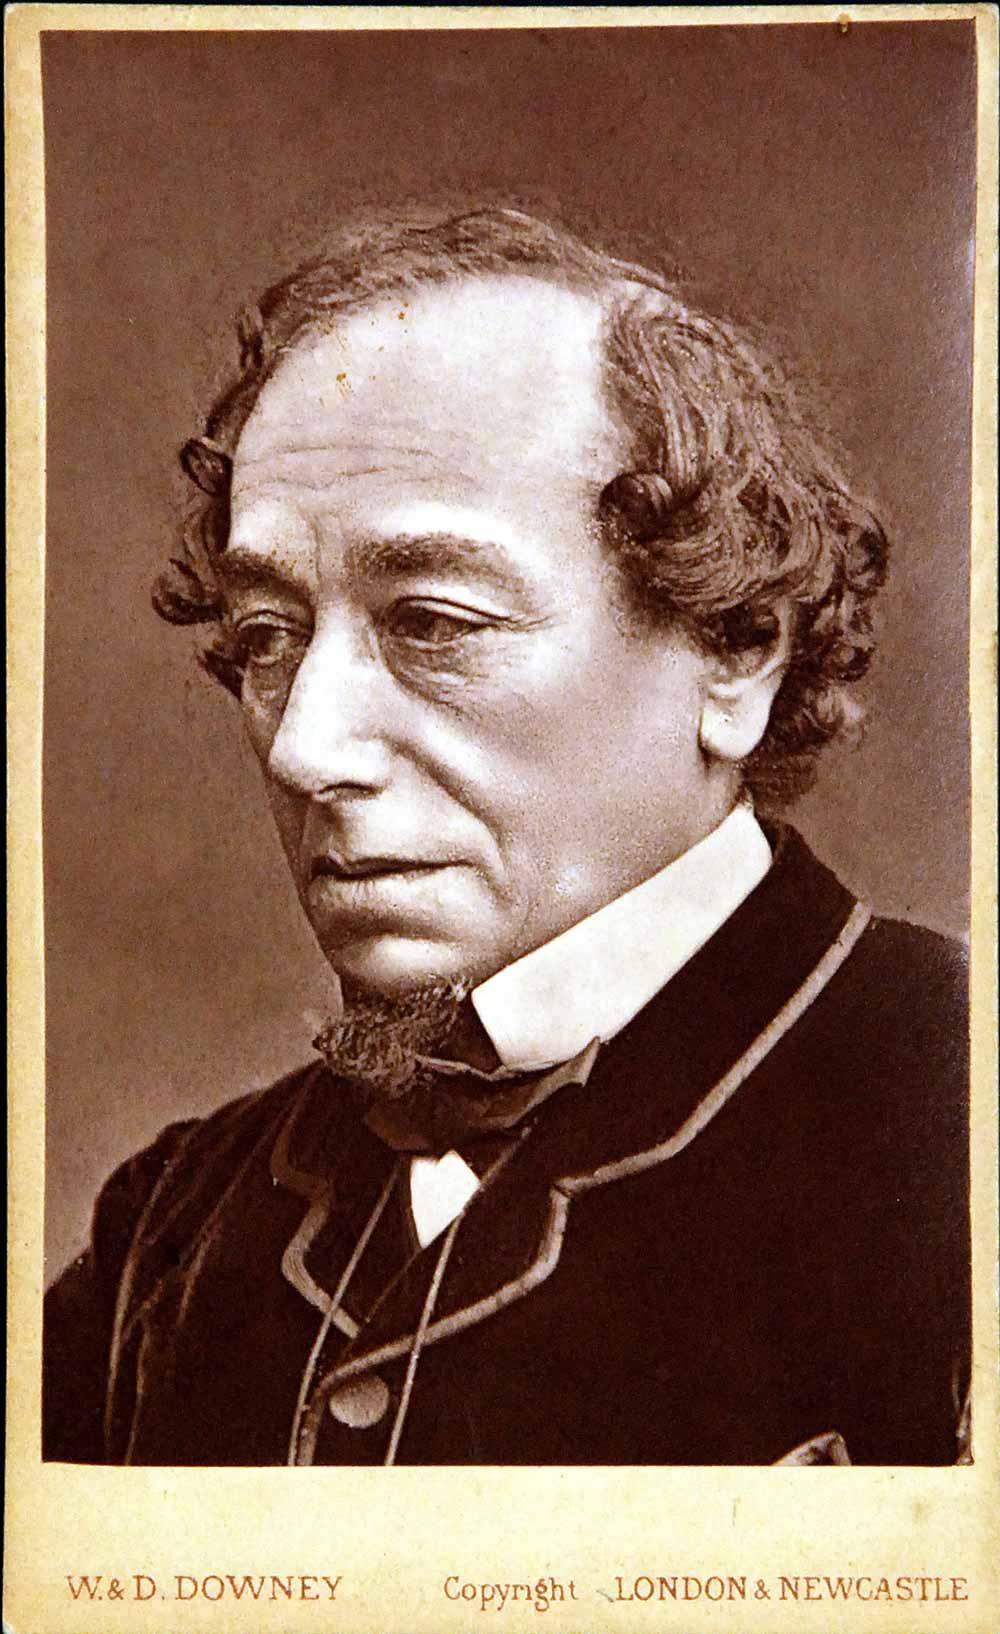 Carte de visite of Benjamin Disraeli, 1st Earl of Beaconsfield, by W. & D. Downey, London, undated.